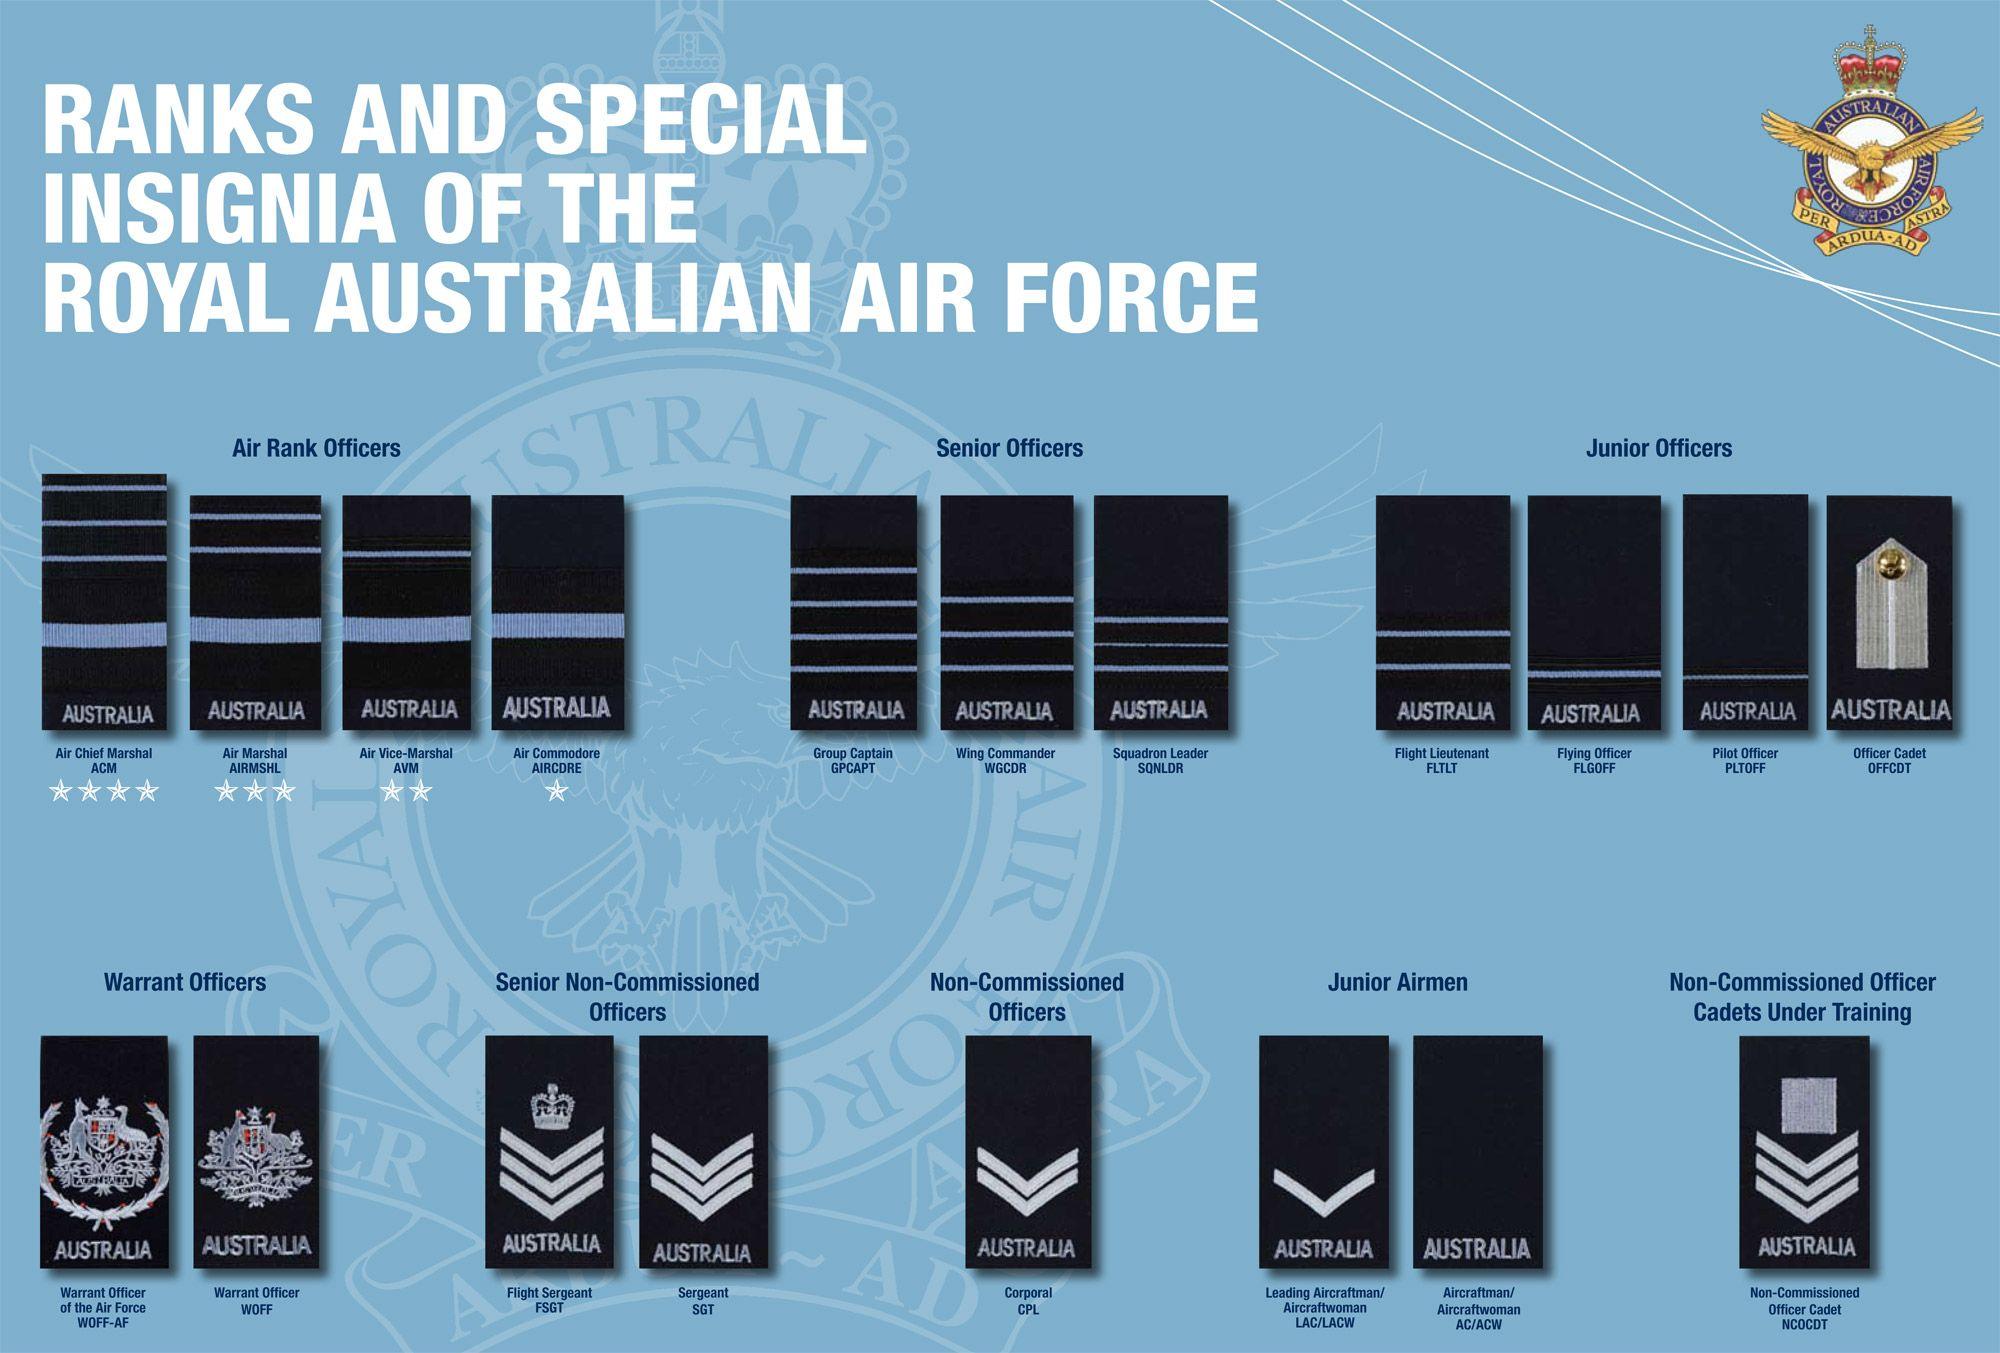 Australian Air Force ranks image large version Air